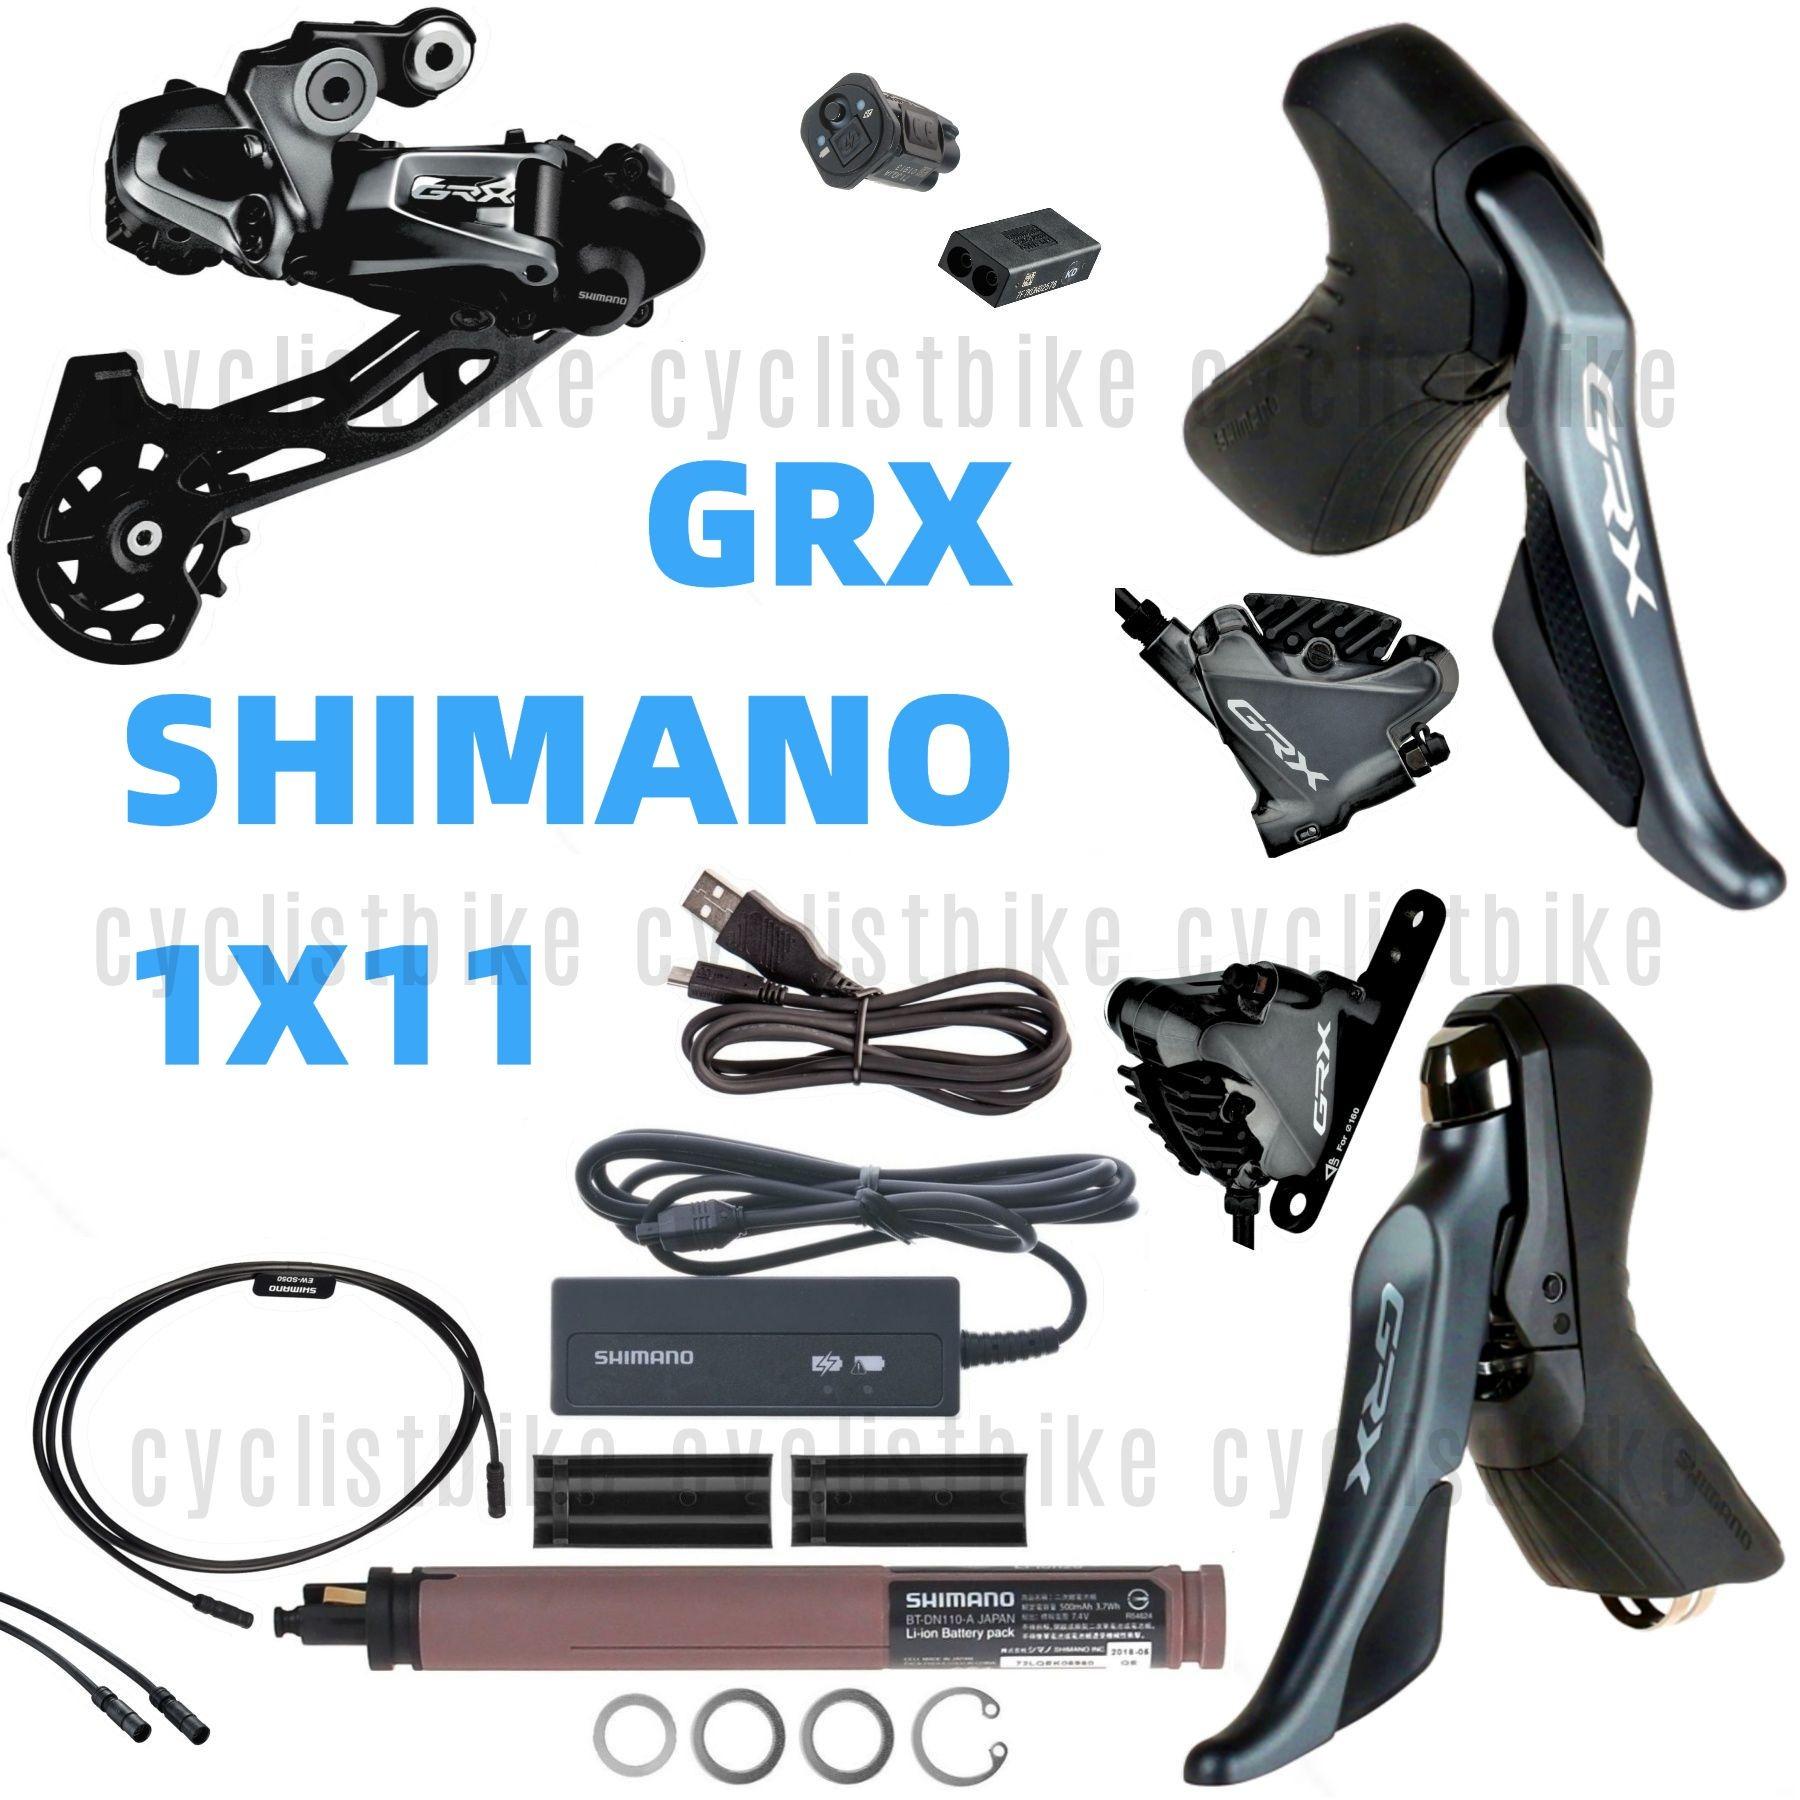 Shimano Ultegra R8050 DI2 Electric Upgrade Groupset Kit w//o Shifters NIB